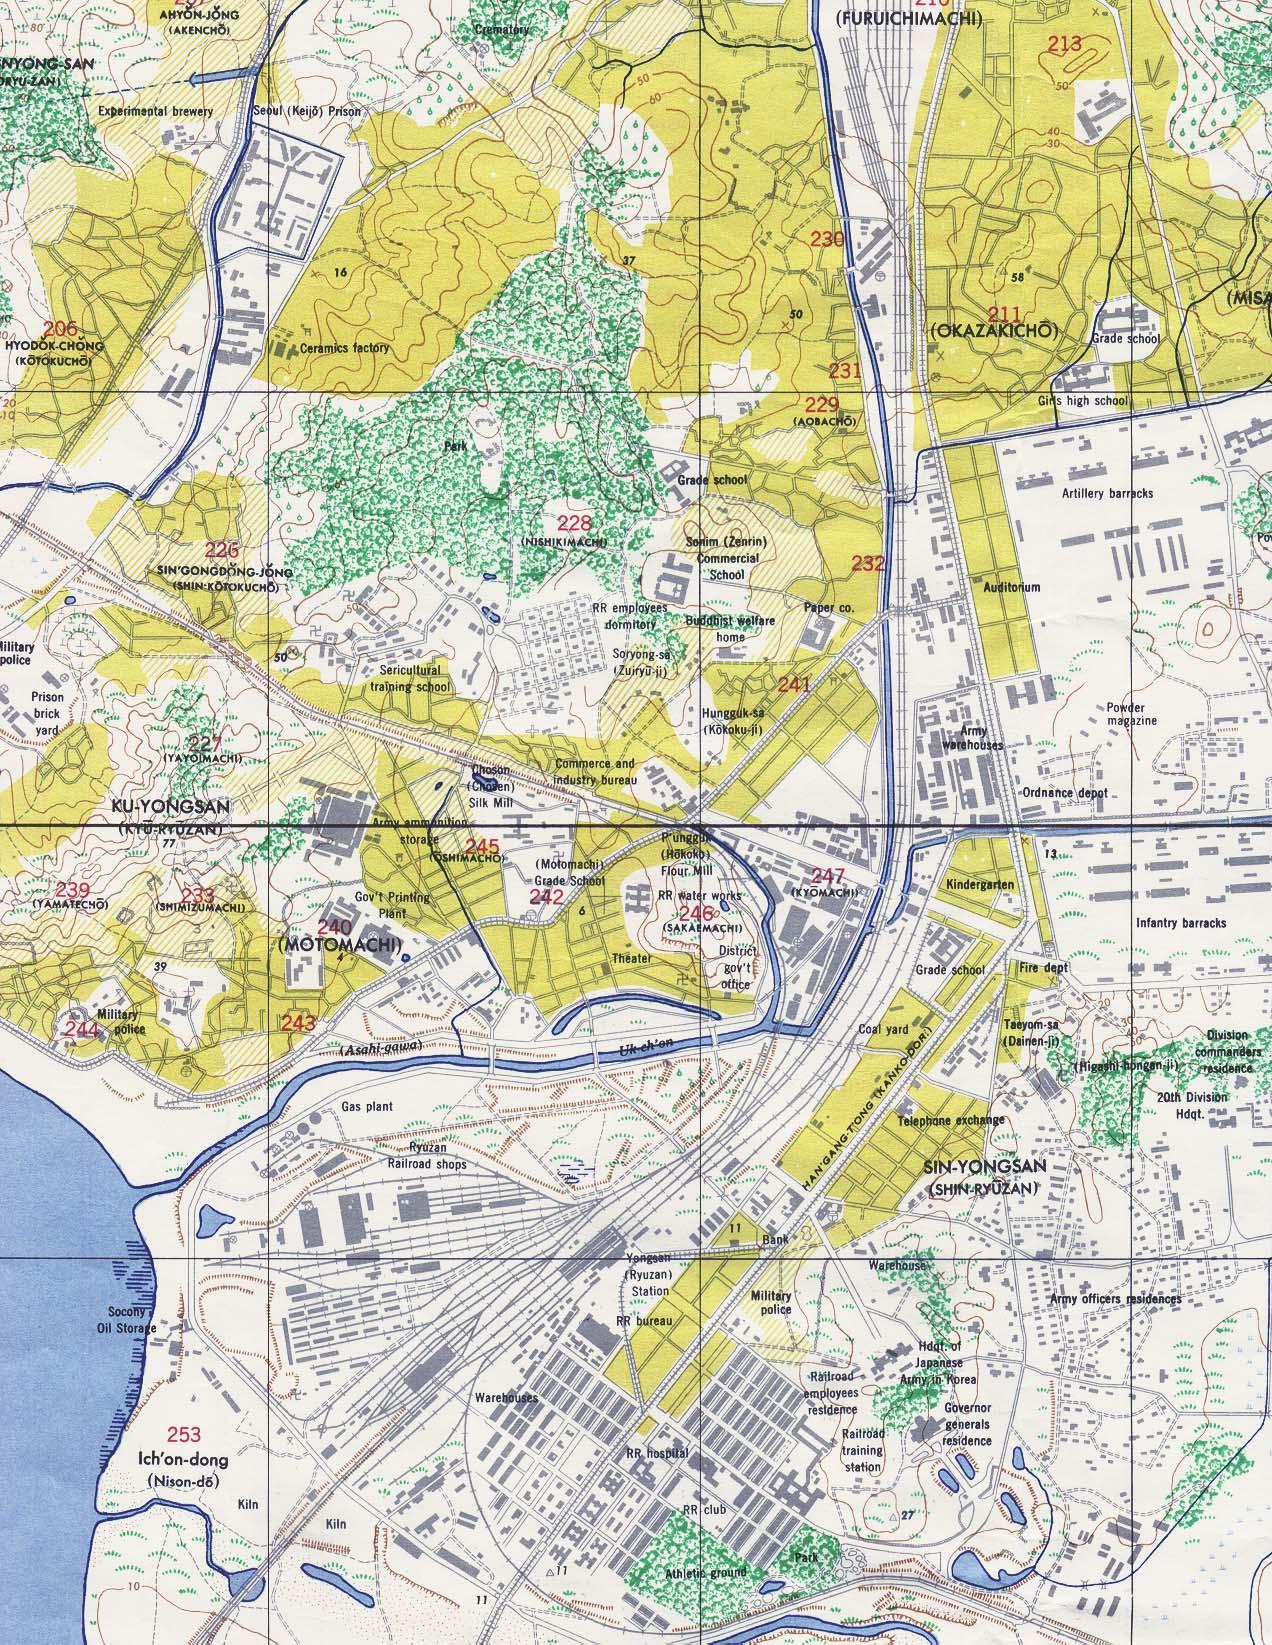 Southern Seoul Map, South Korea 1946